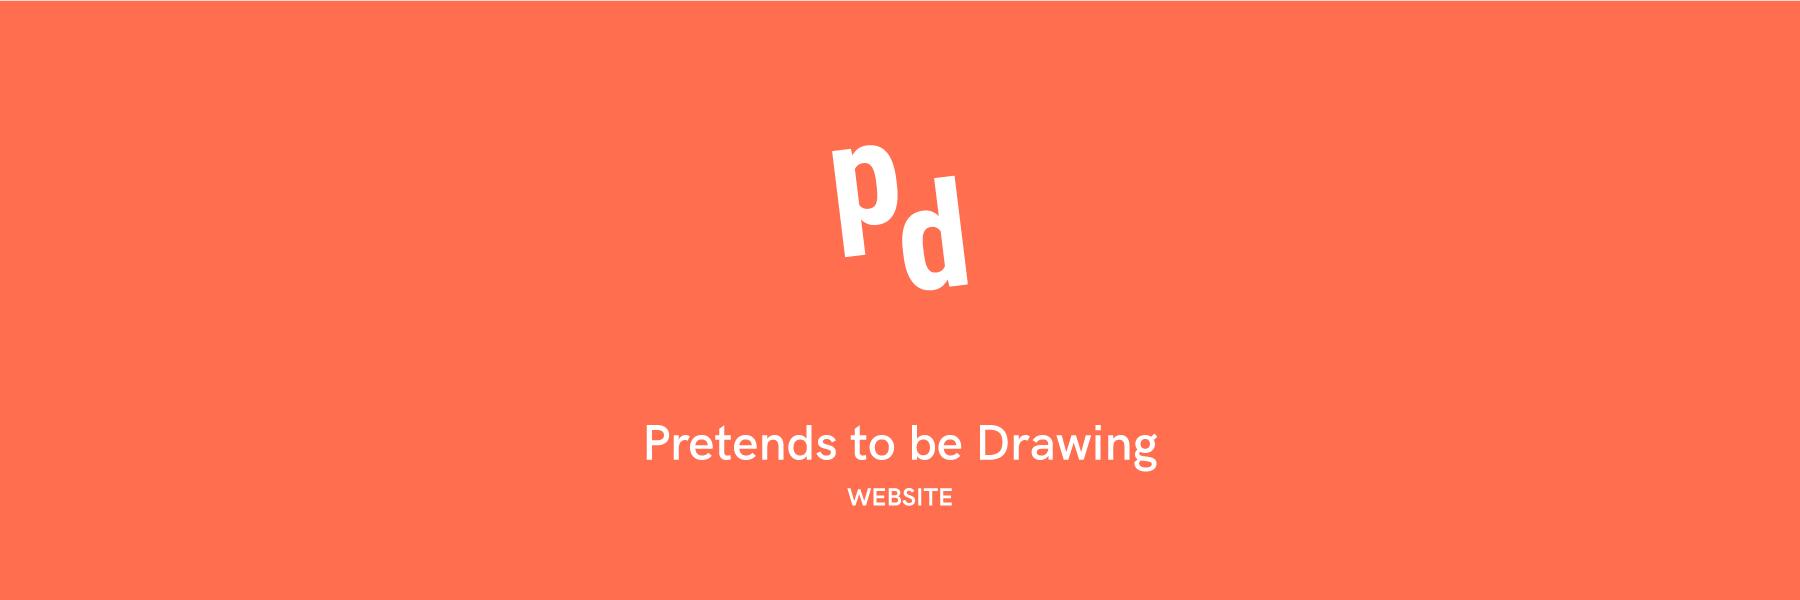 ptbd-comic